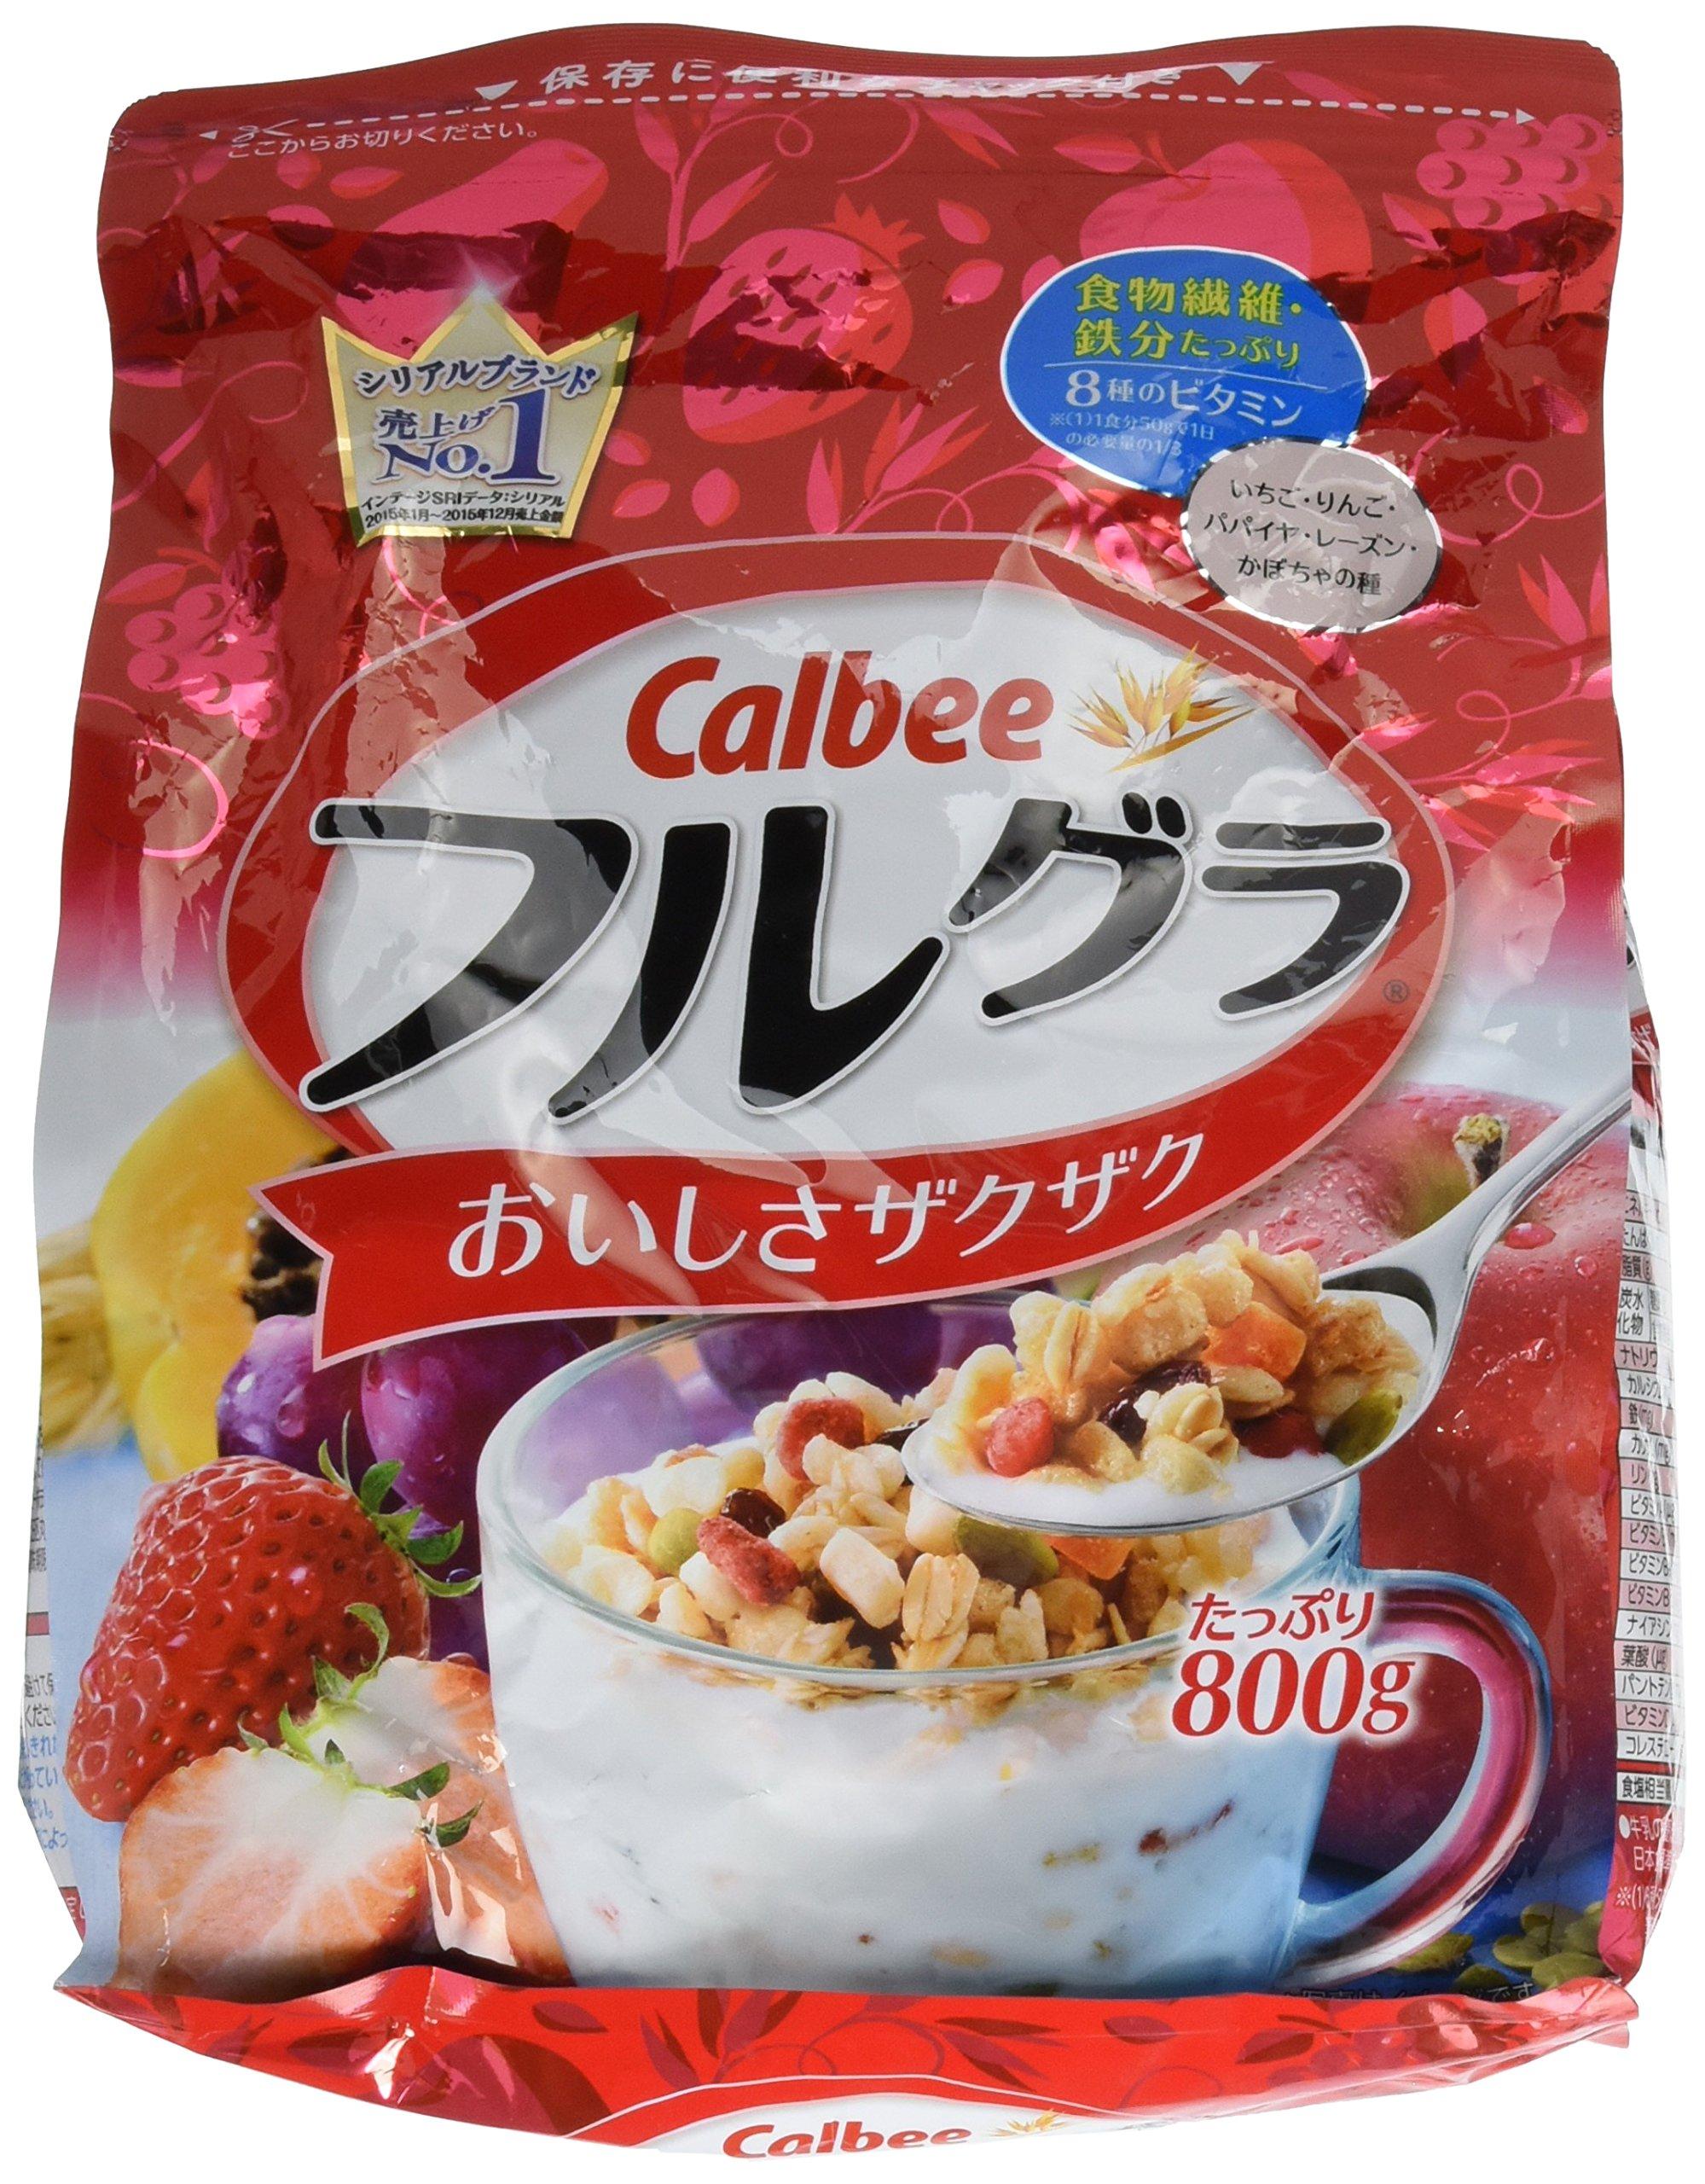 Calbee Fruit granola 800g x 2 Packs